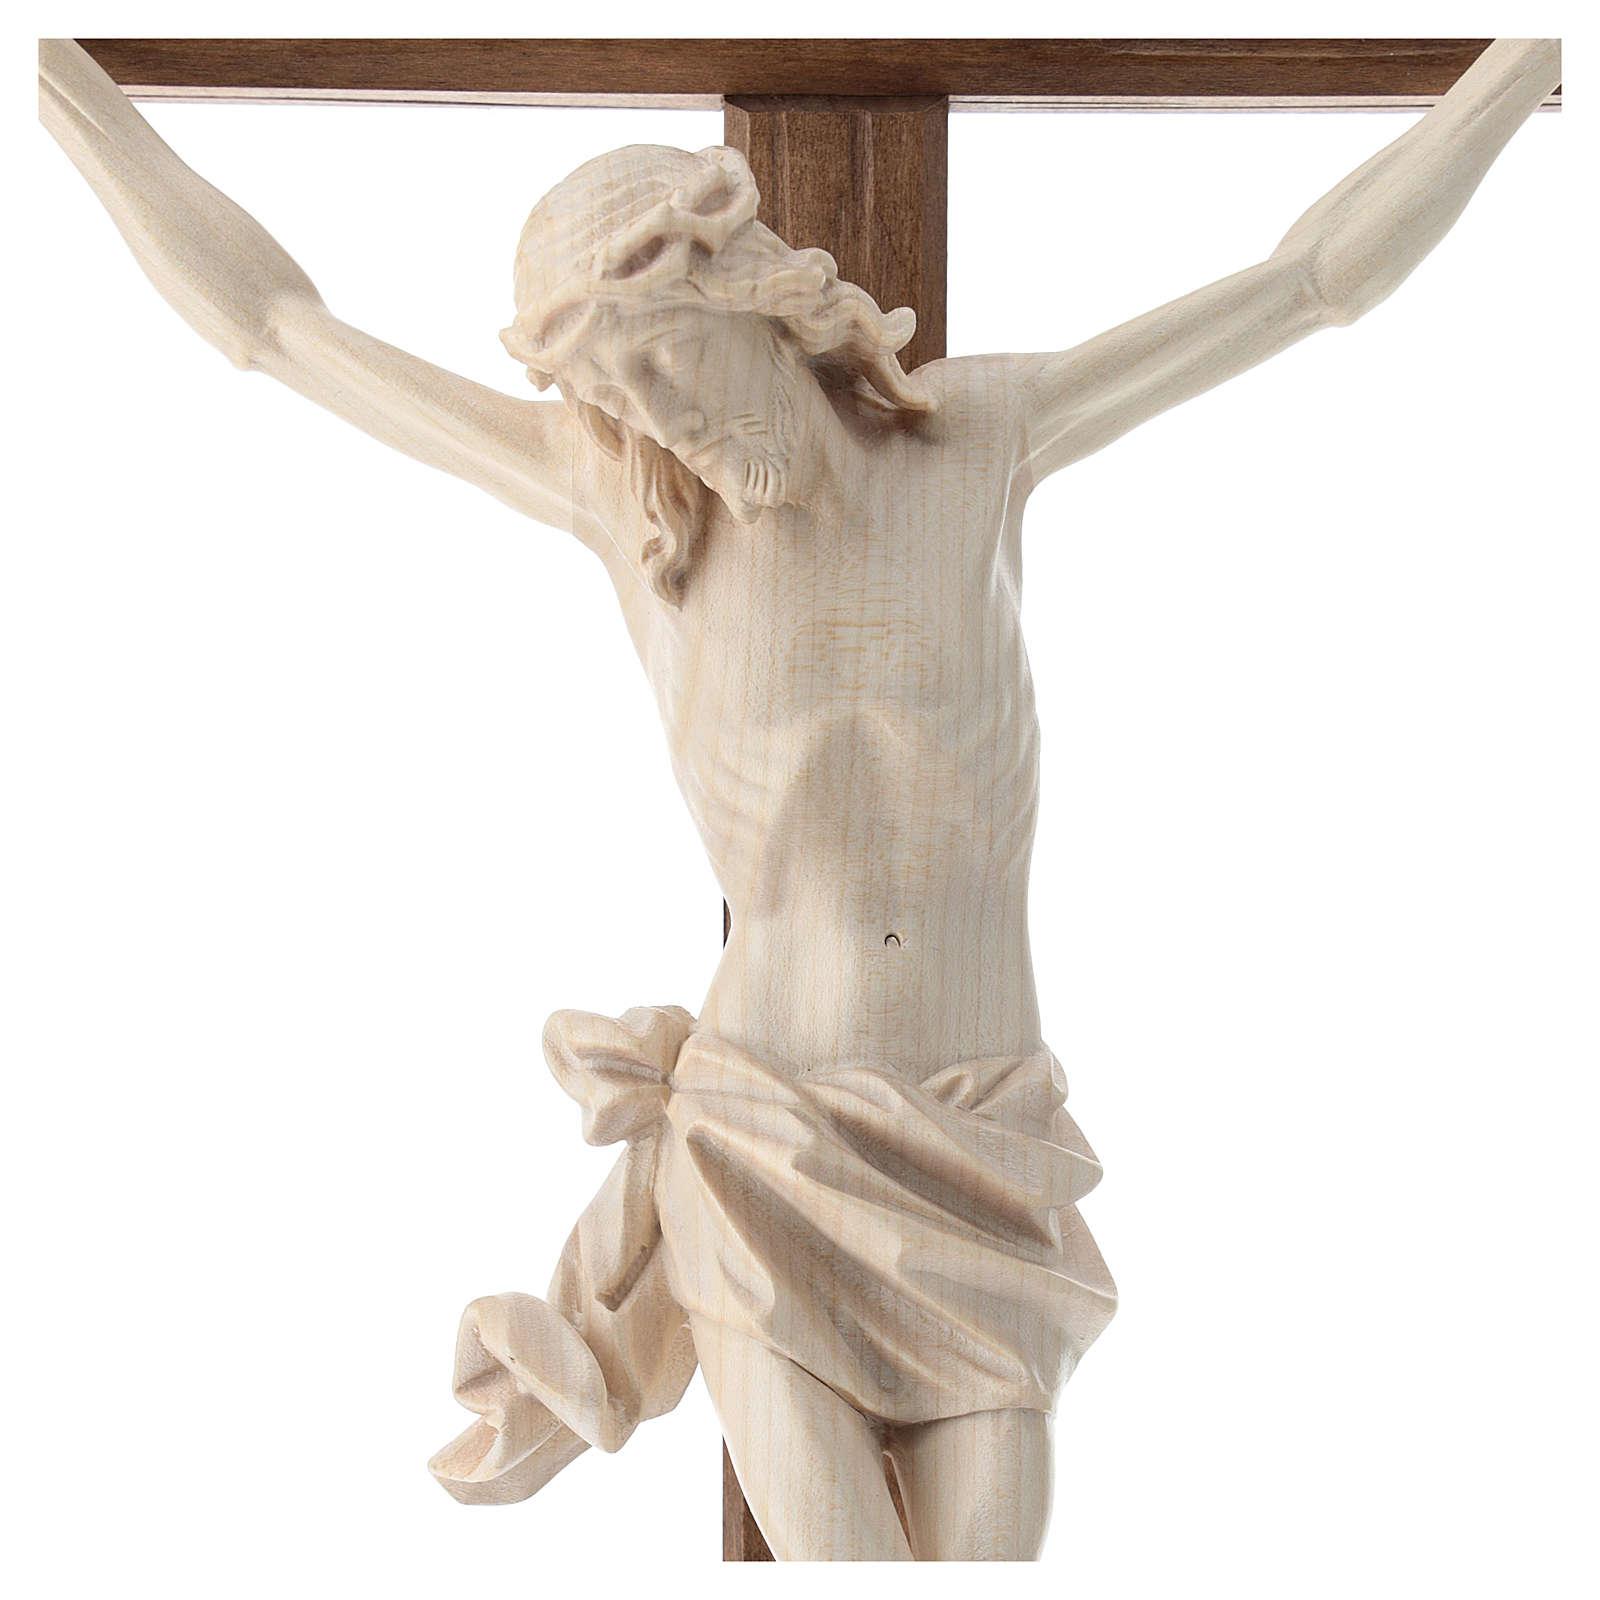 Crucifix mod. Corpus droit bois naturel ciré Valgardena 4